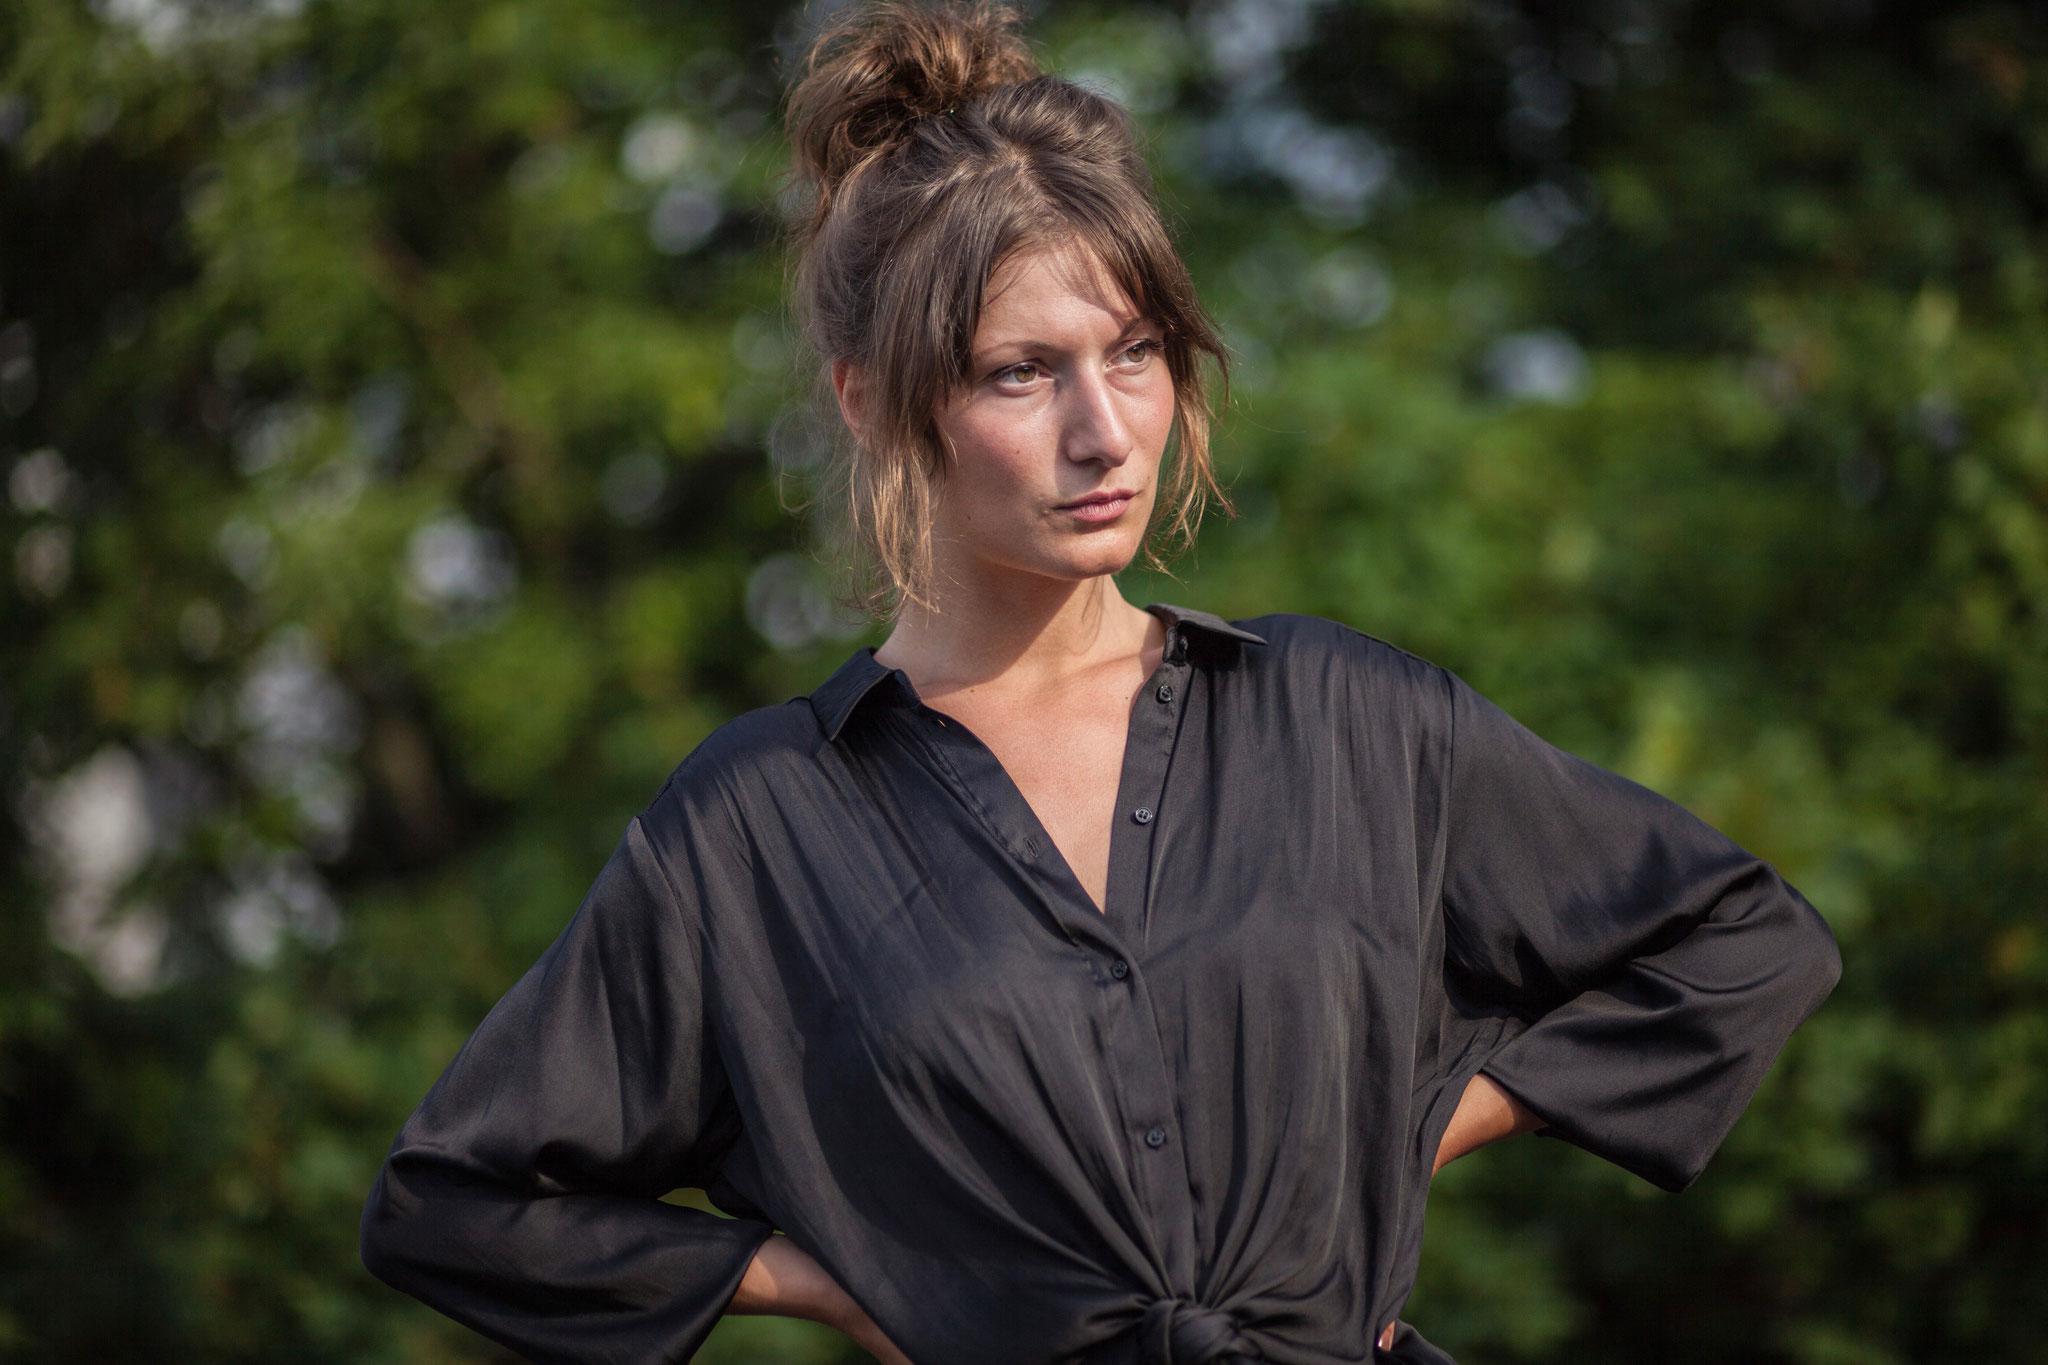 Johanna Adelsberger